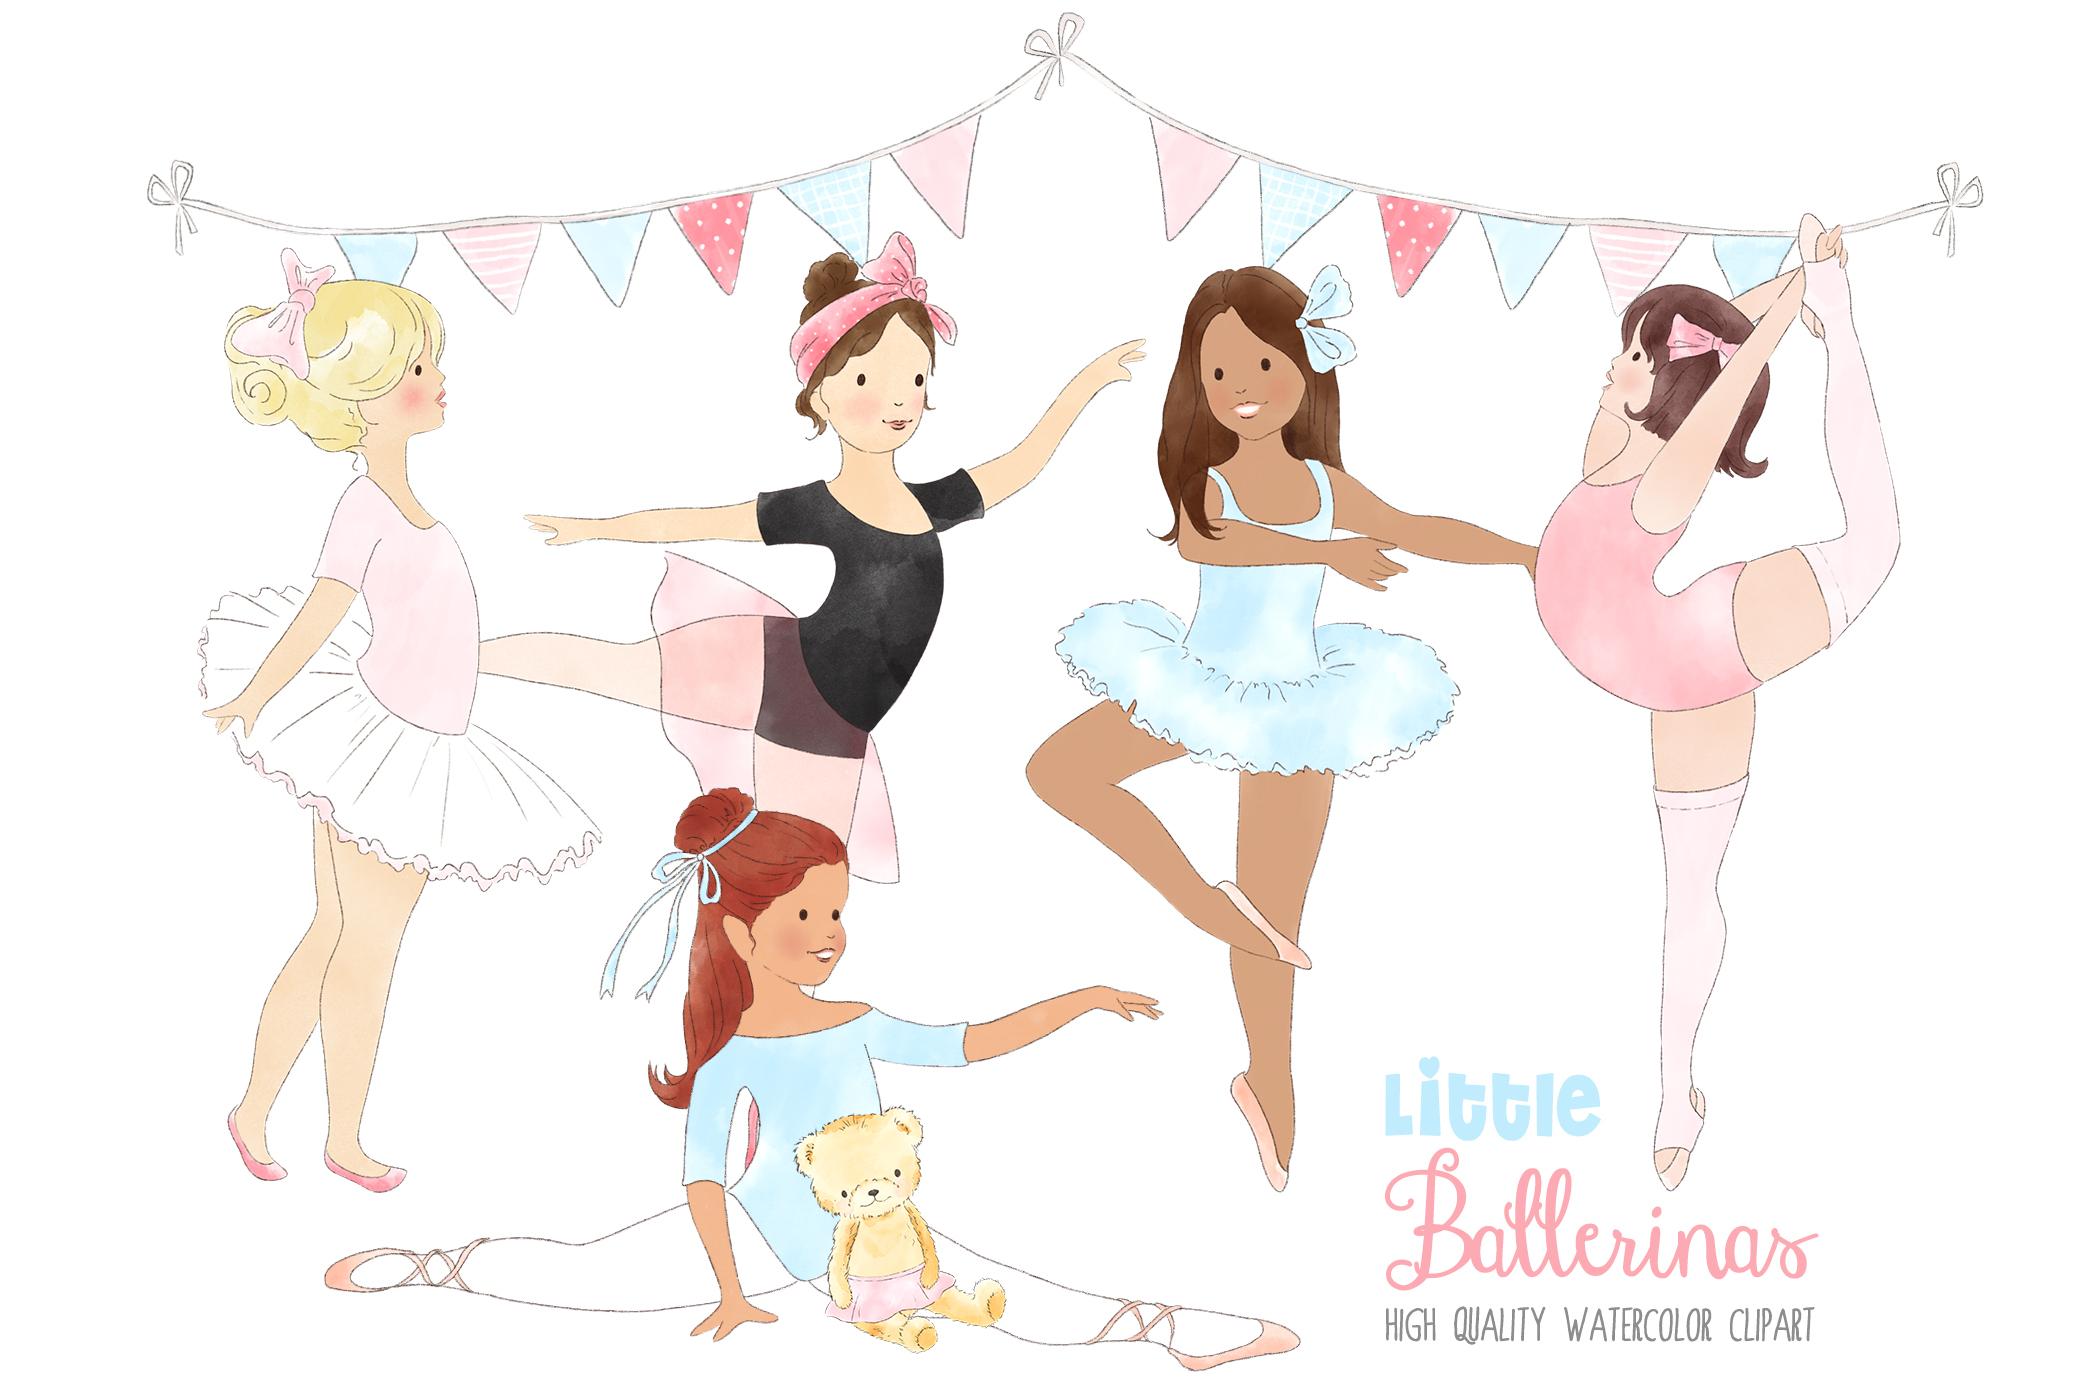 Ballerina clipart little girl. Ballerinas ballet dancing